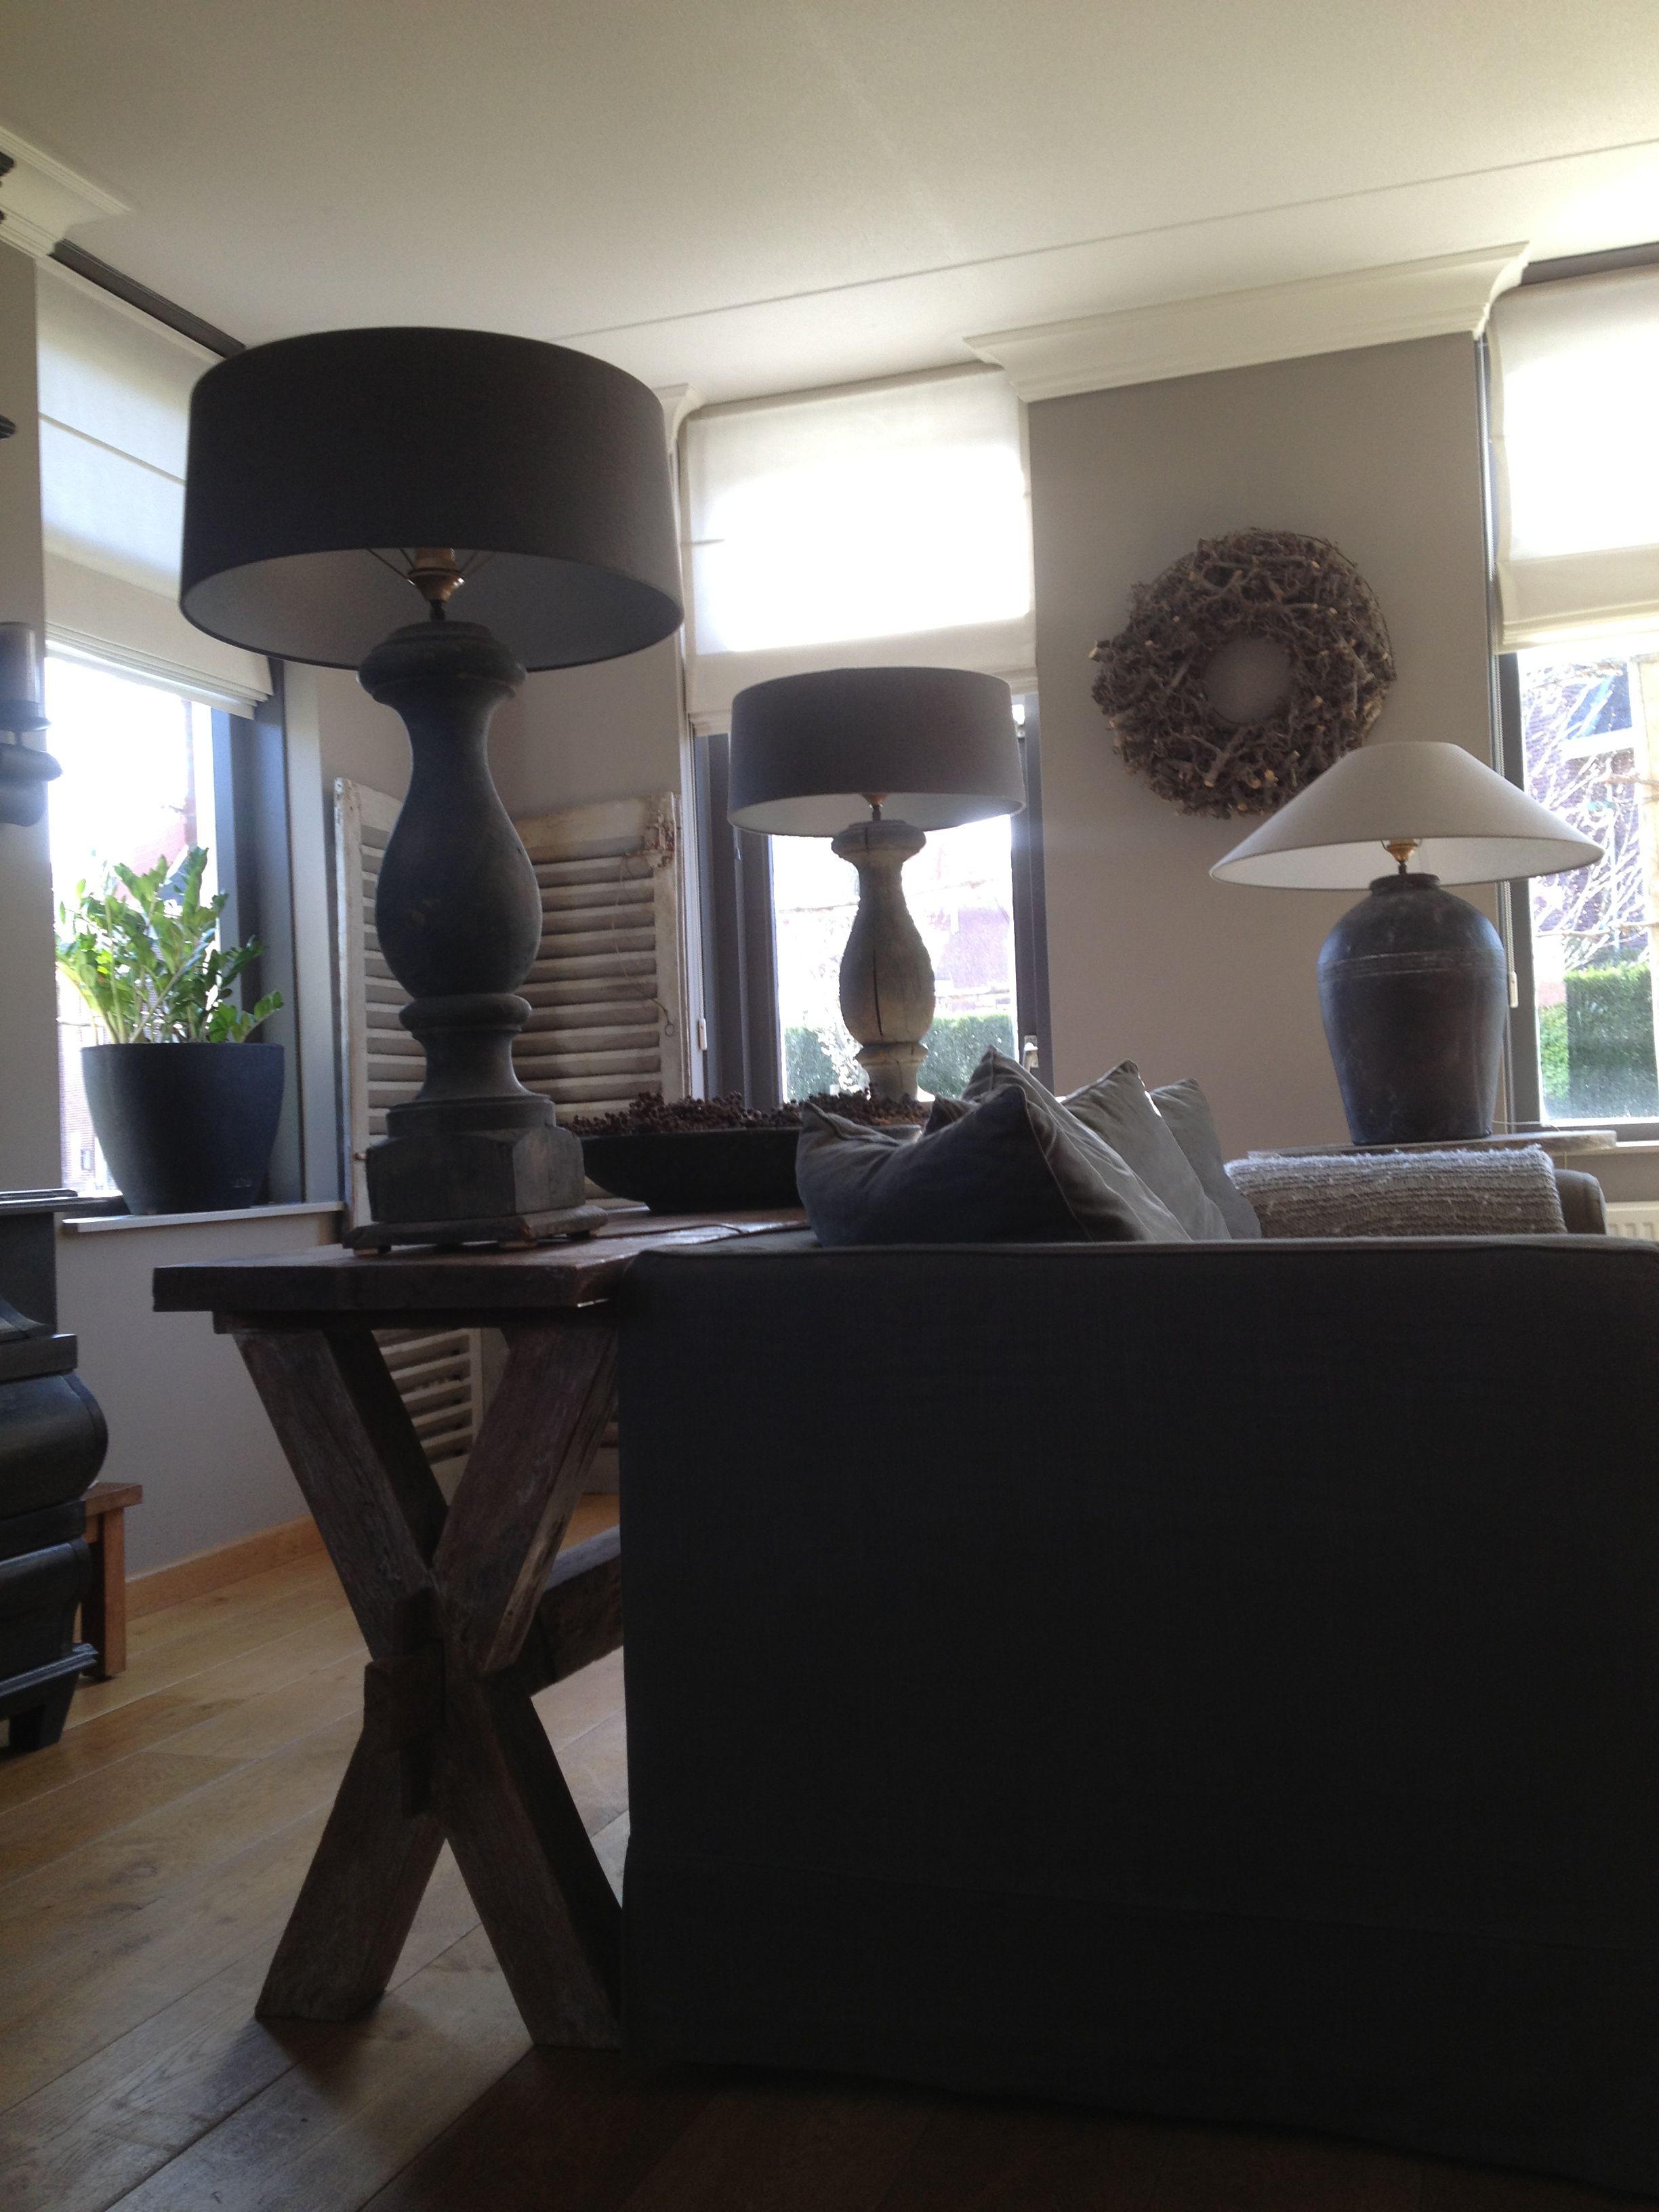 Woonkamer met mooie lampen | living room | Pinterest | Wohnzimmer ...